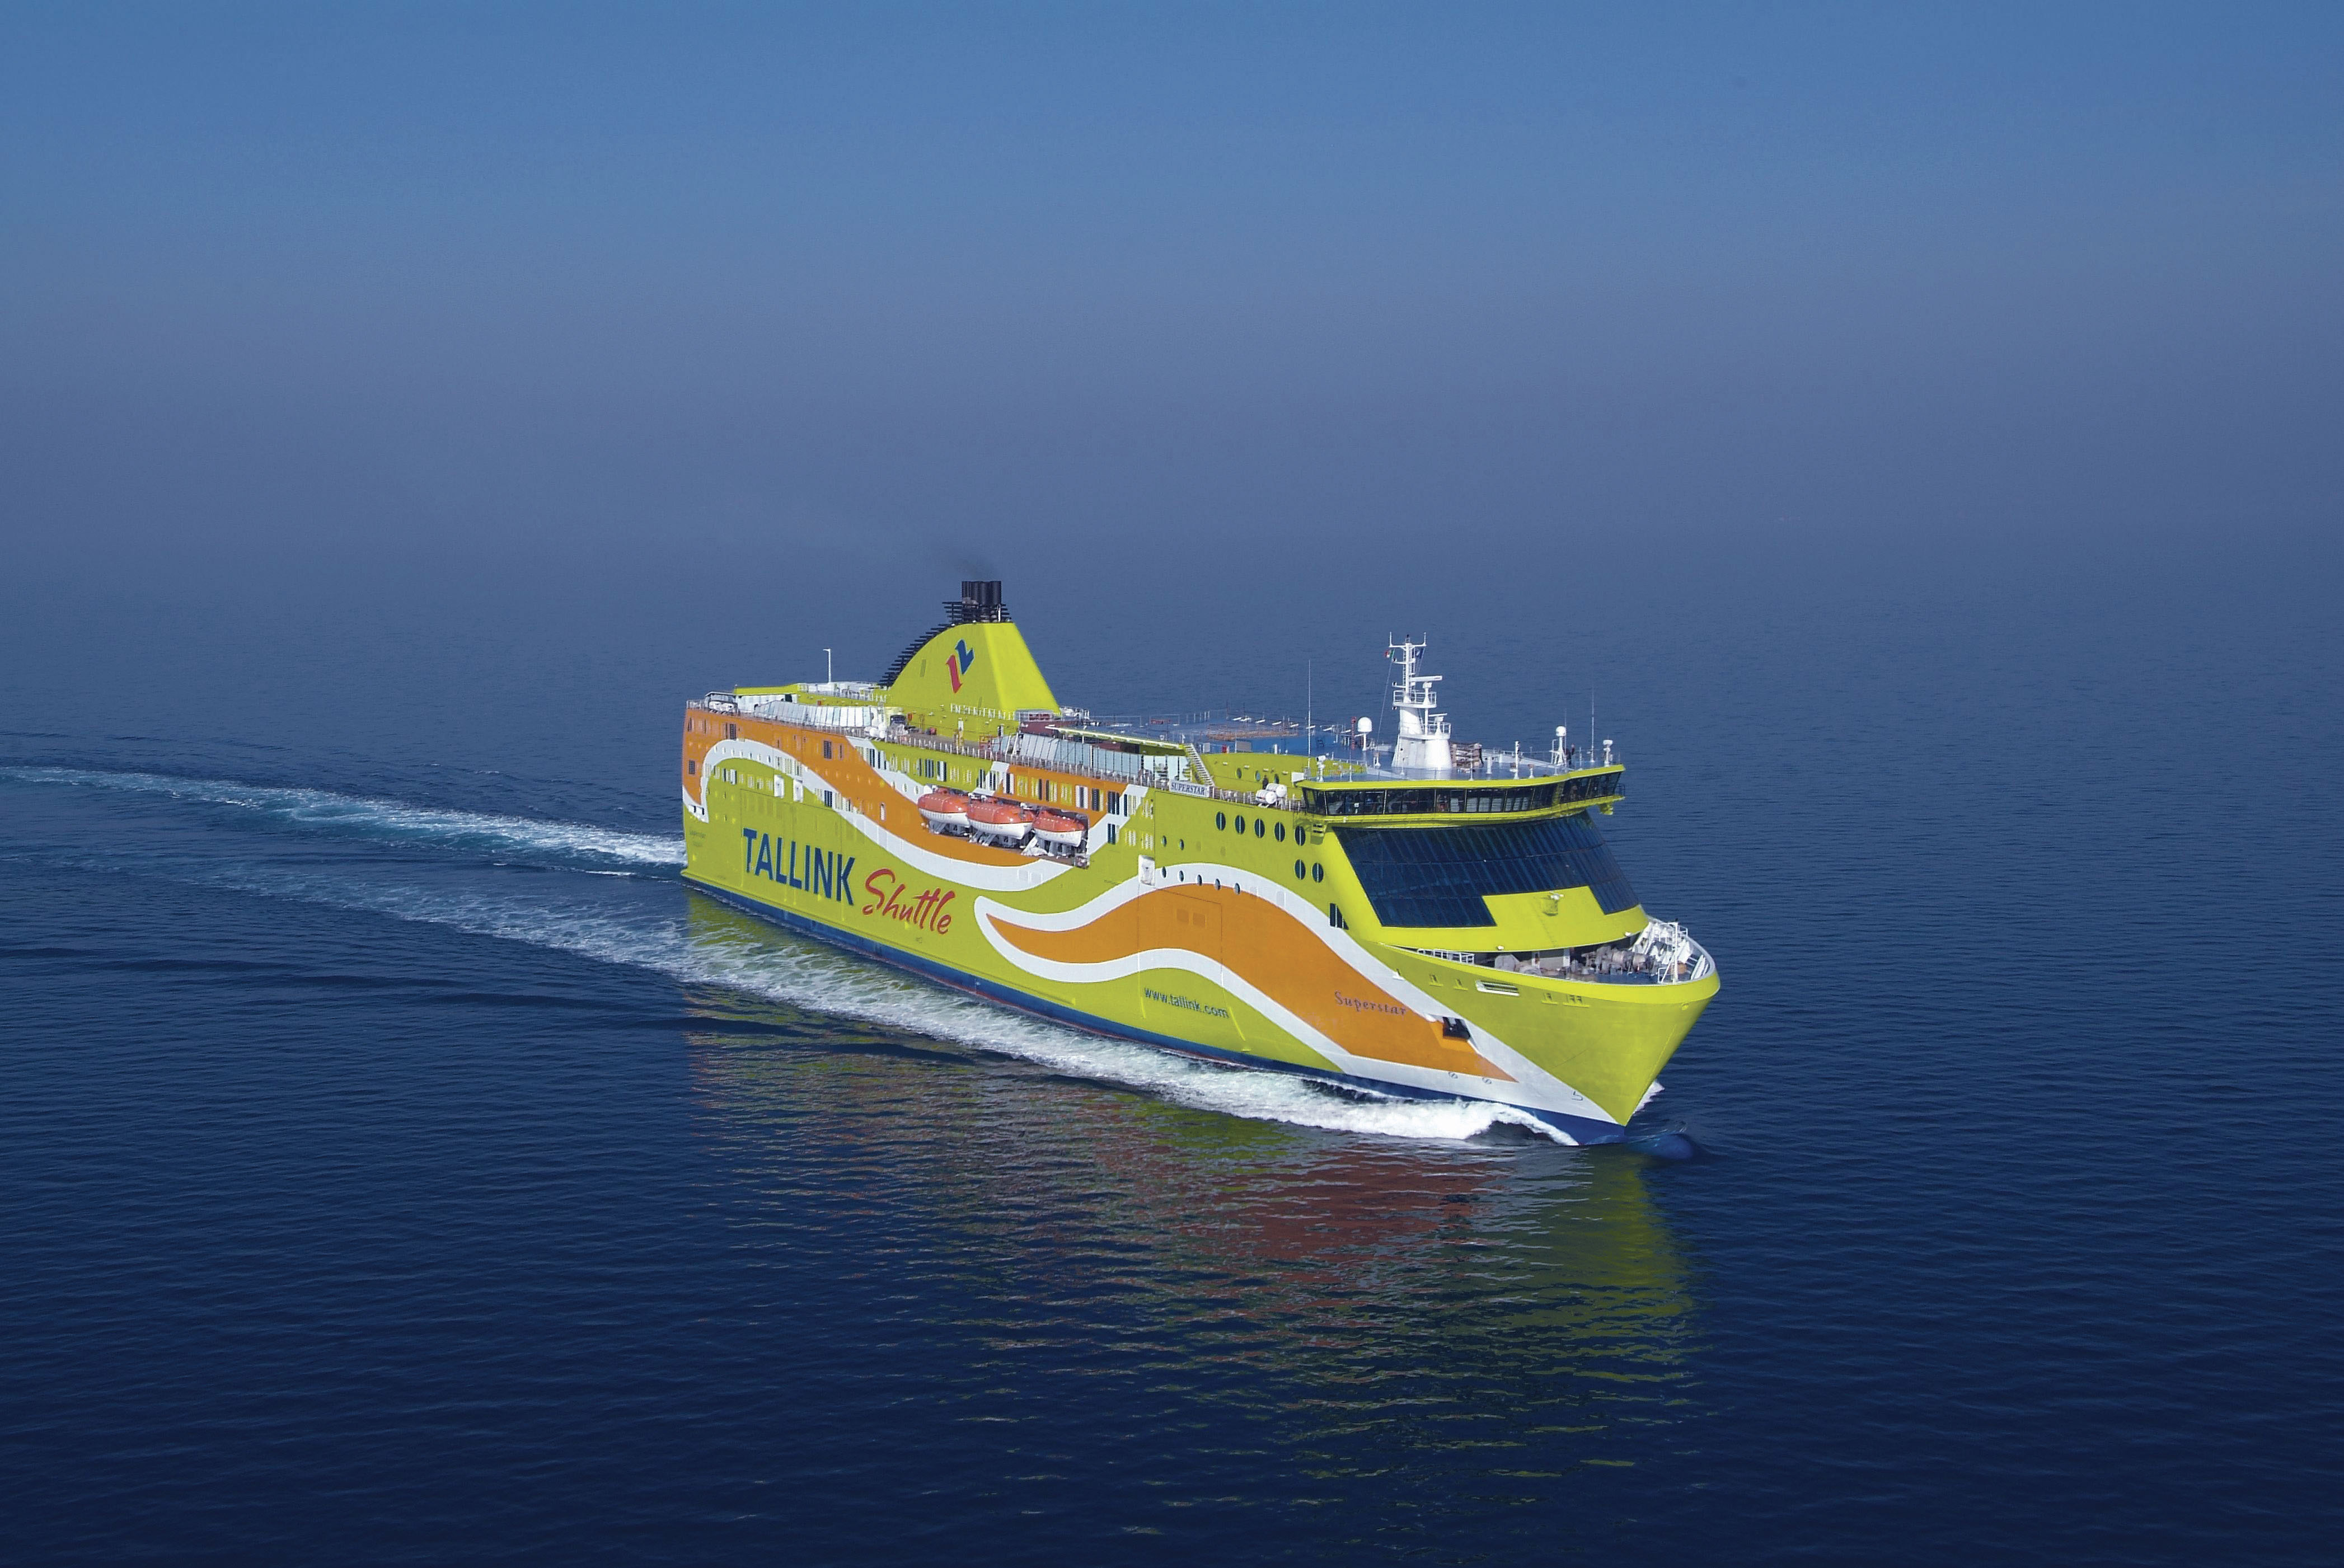 Tallink Silja Oy